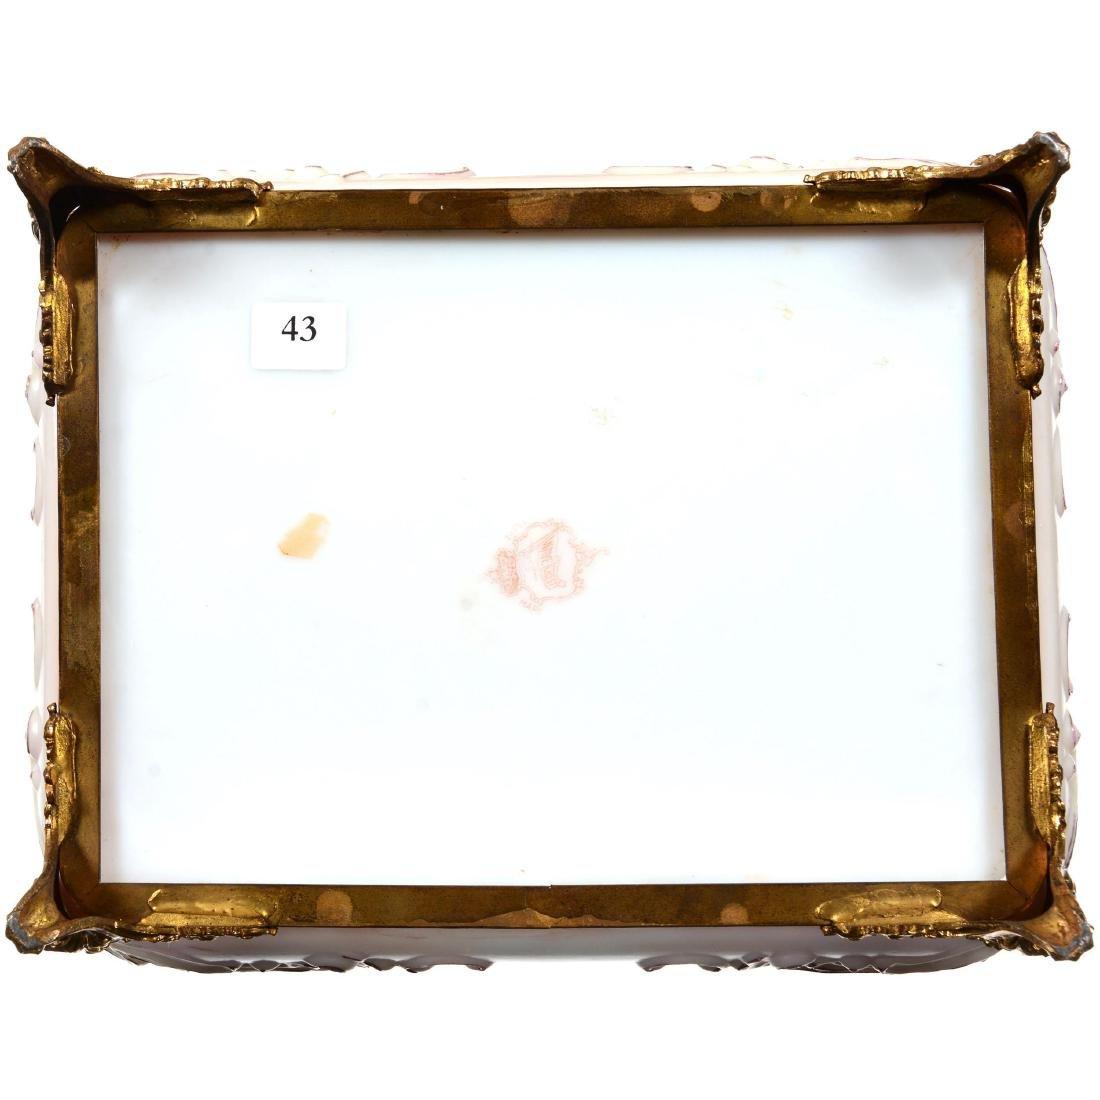 Wavecrest (Banner Mark) Hinged Rectangular Vanity Box - 4